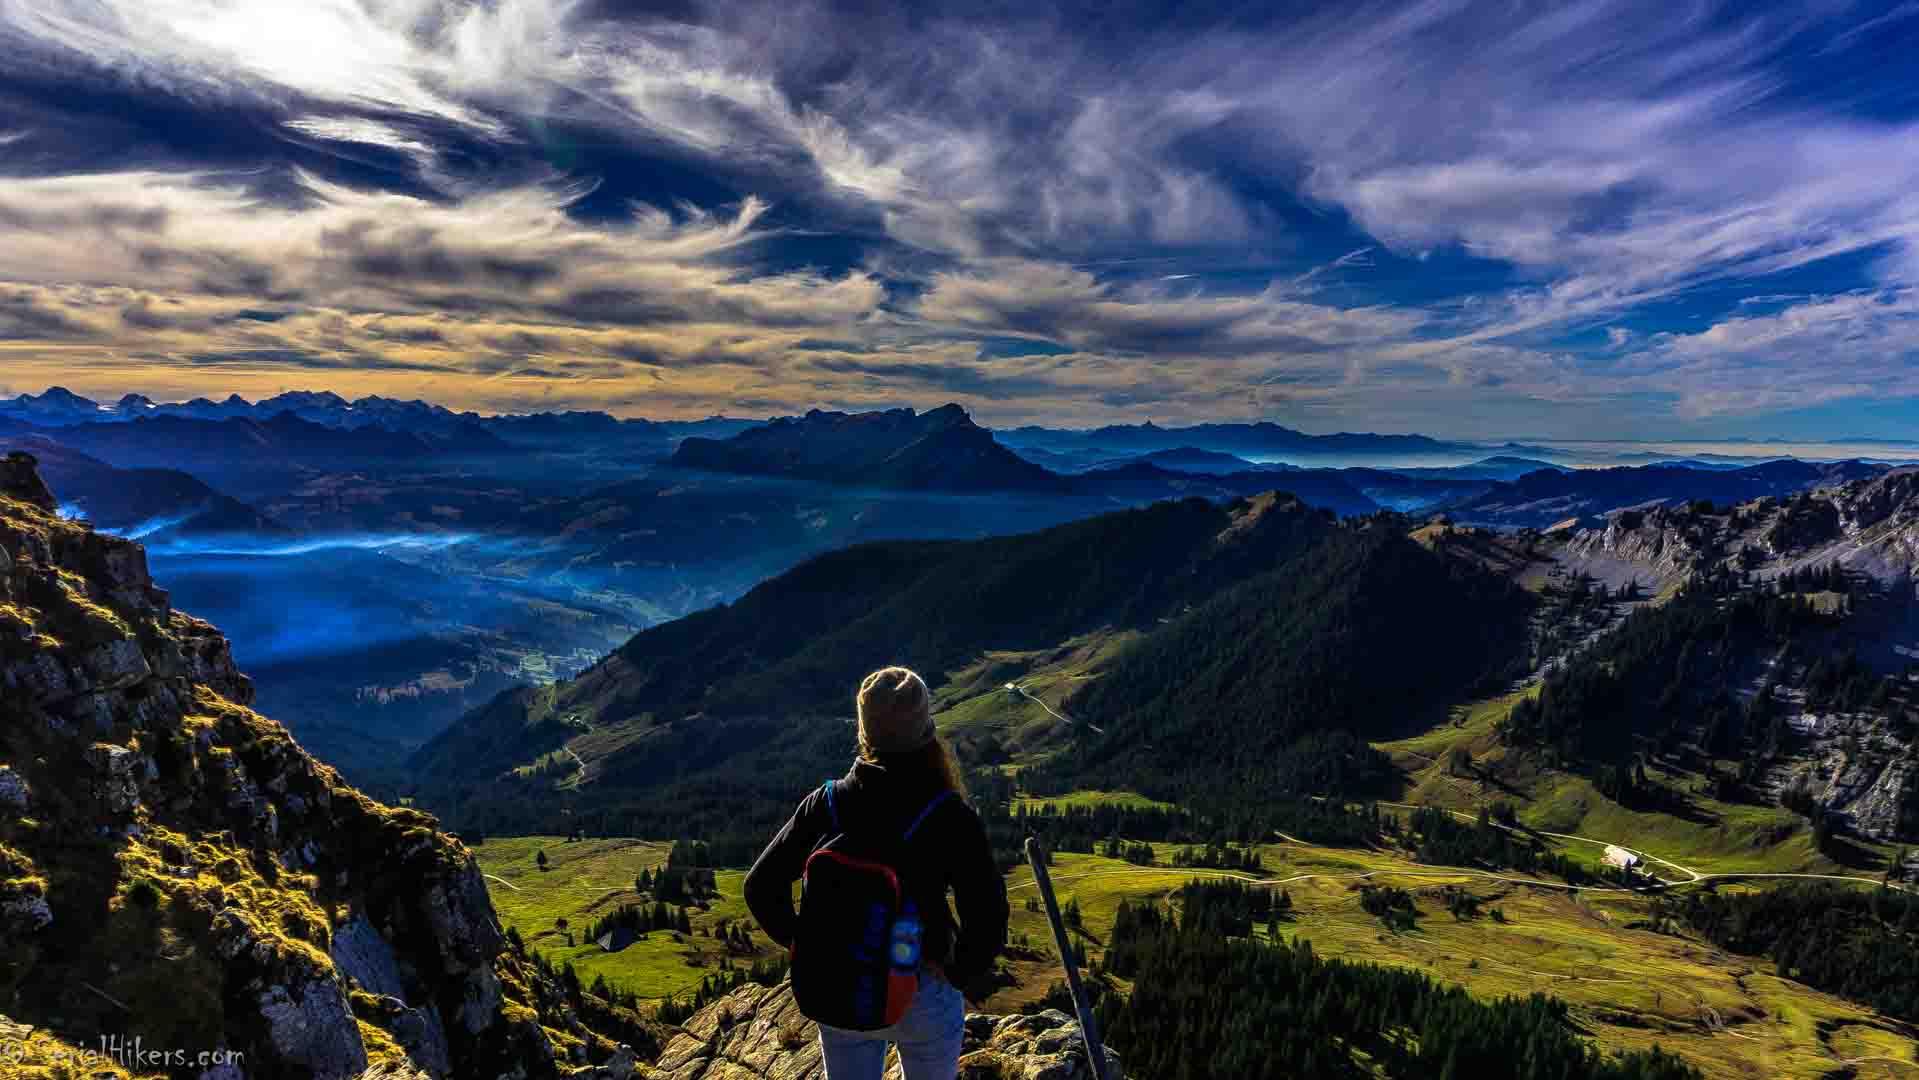 Jul&Gaux SerialHikers autostop hitchhiking aventure adventure alternative travel voyage volontariat volonteering couchsurfing trustroots montagnes suisses